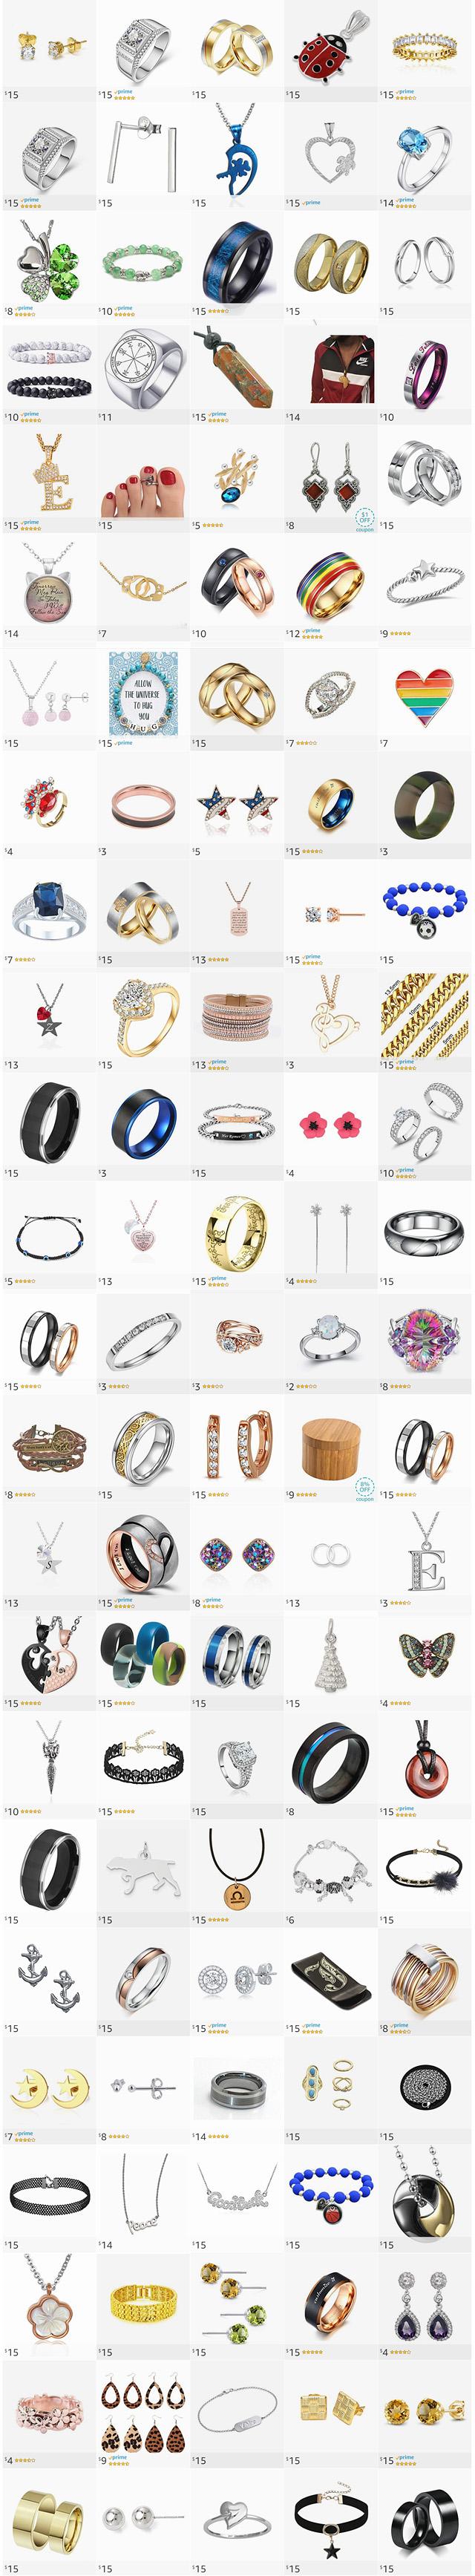 Cheap Jewelry Under Twenty Dollars